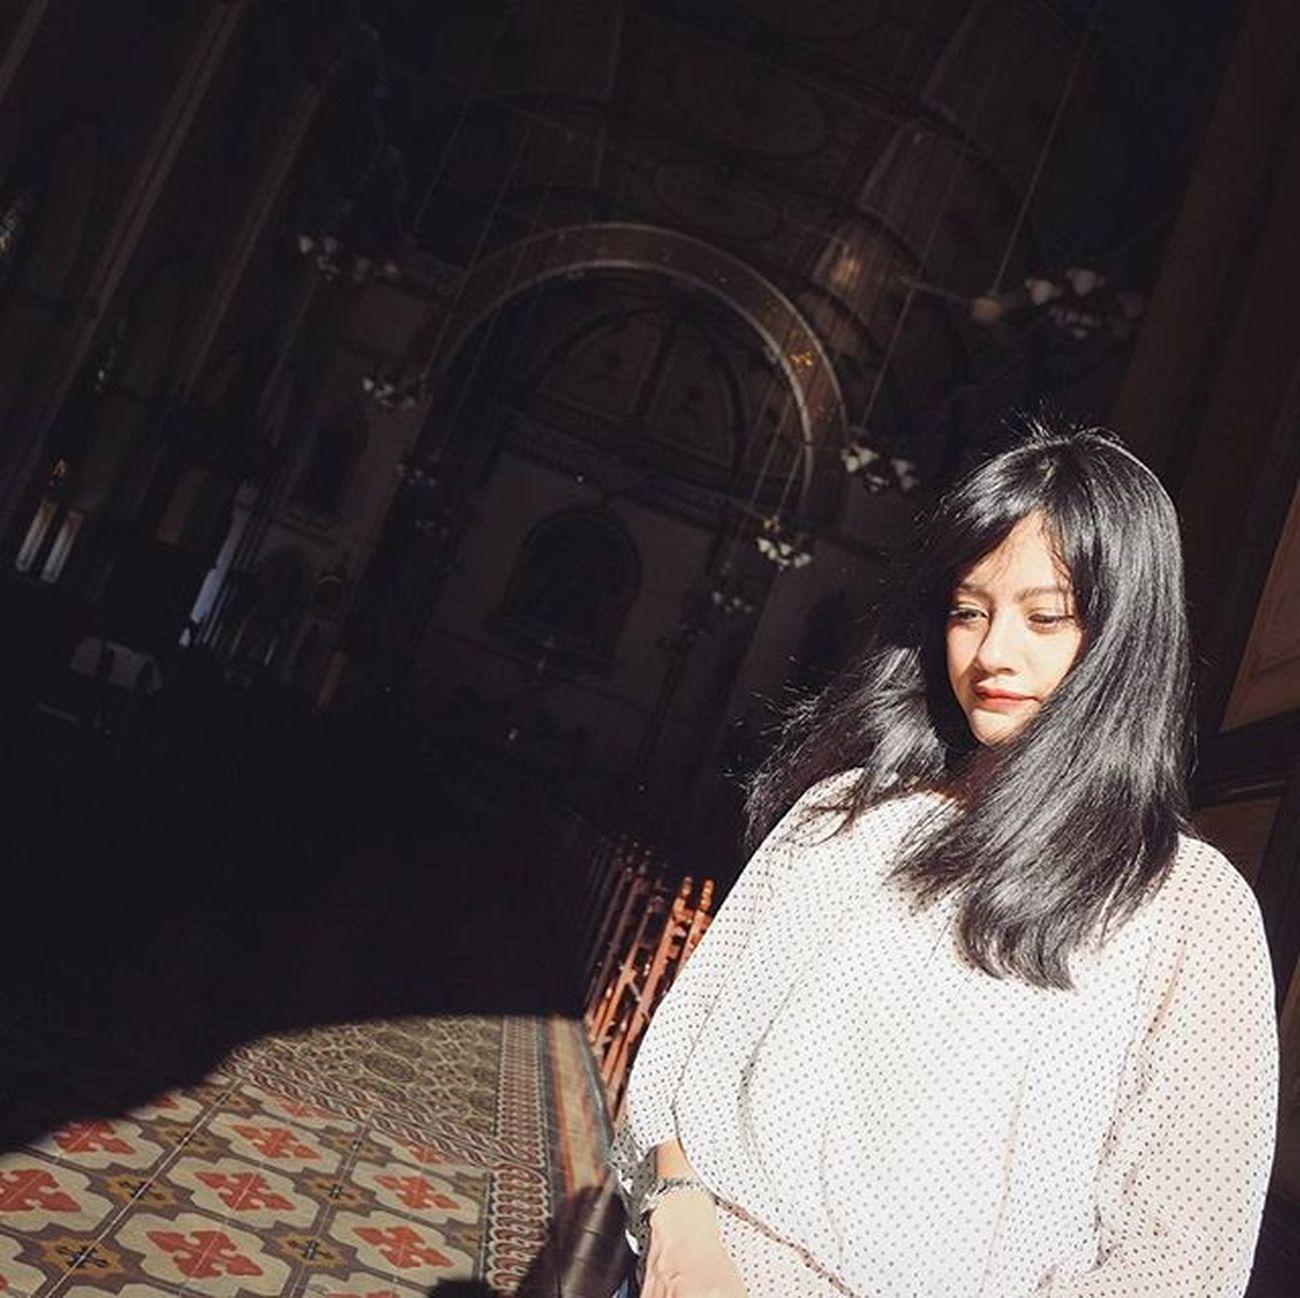 . ... ..... ....... ..... ... Vscofilm Vscofilter Adayinthailand Adorable Girl Woman Portrait Film Vscothai Vscocamthailand Vscogram VSCO VSCOPH Vsco_lover InstaVsco Vscocam Vscogood Travelgram Instago Walkwaywhy Fujifilm Fujifilm_xseries Fujixseriesclubthailand Fujifeed Fujiclub fujixm1special_shots